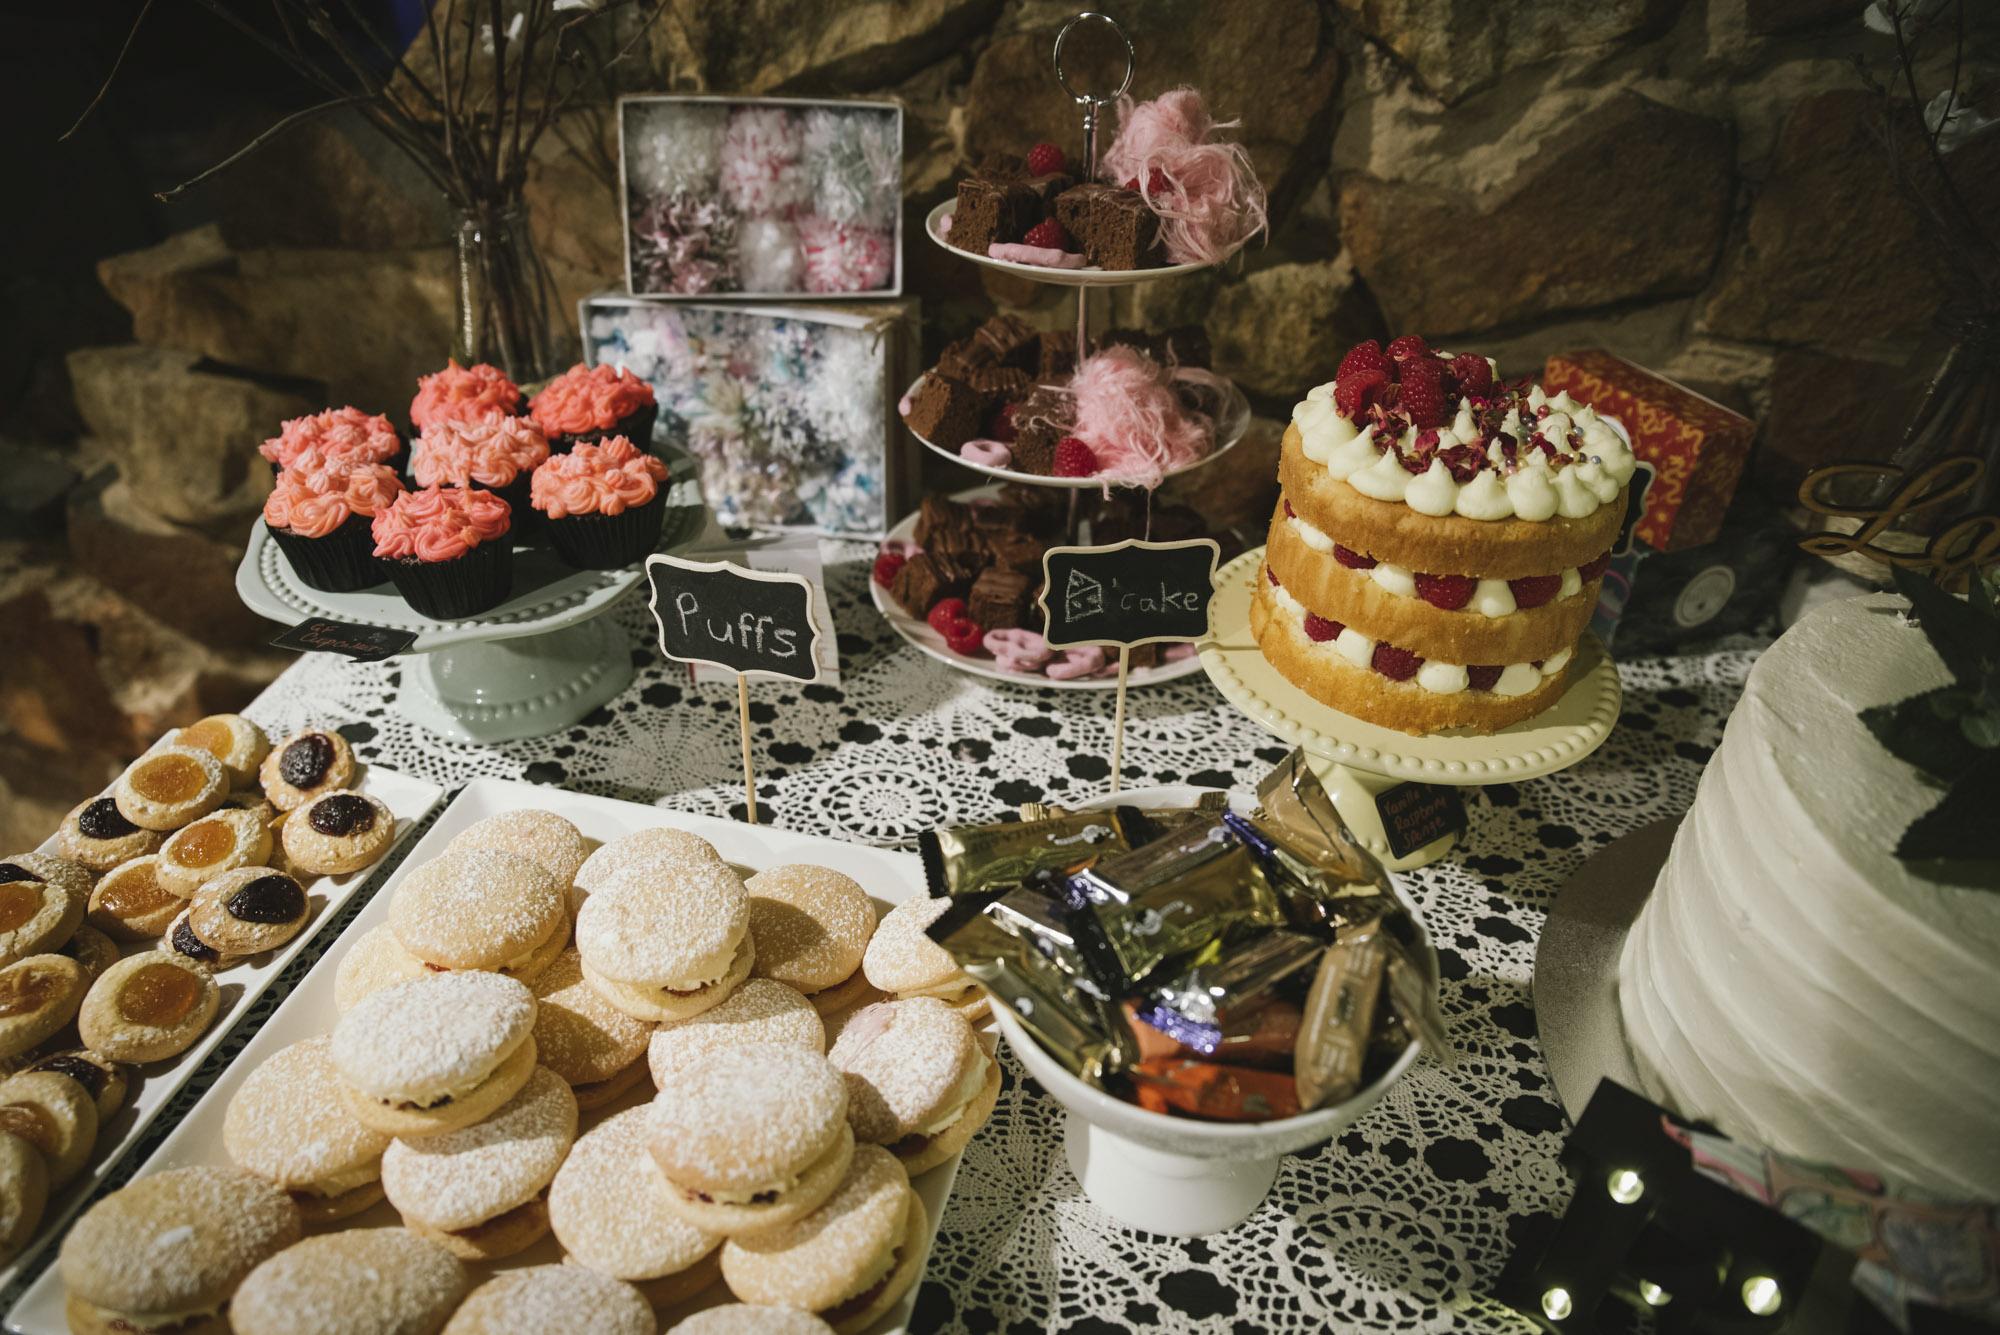 Angie-Roe-Photography-Wedding-Perth-Northam-Wheatbelt-Country-Rural (100).jpg